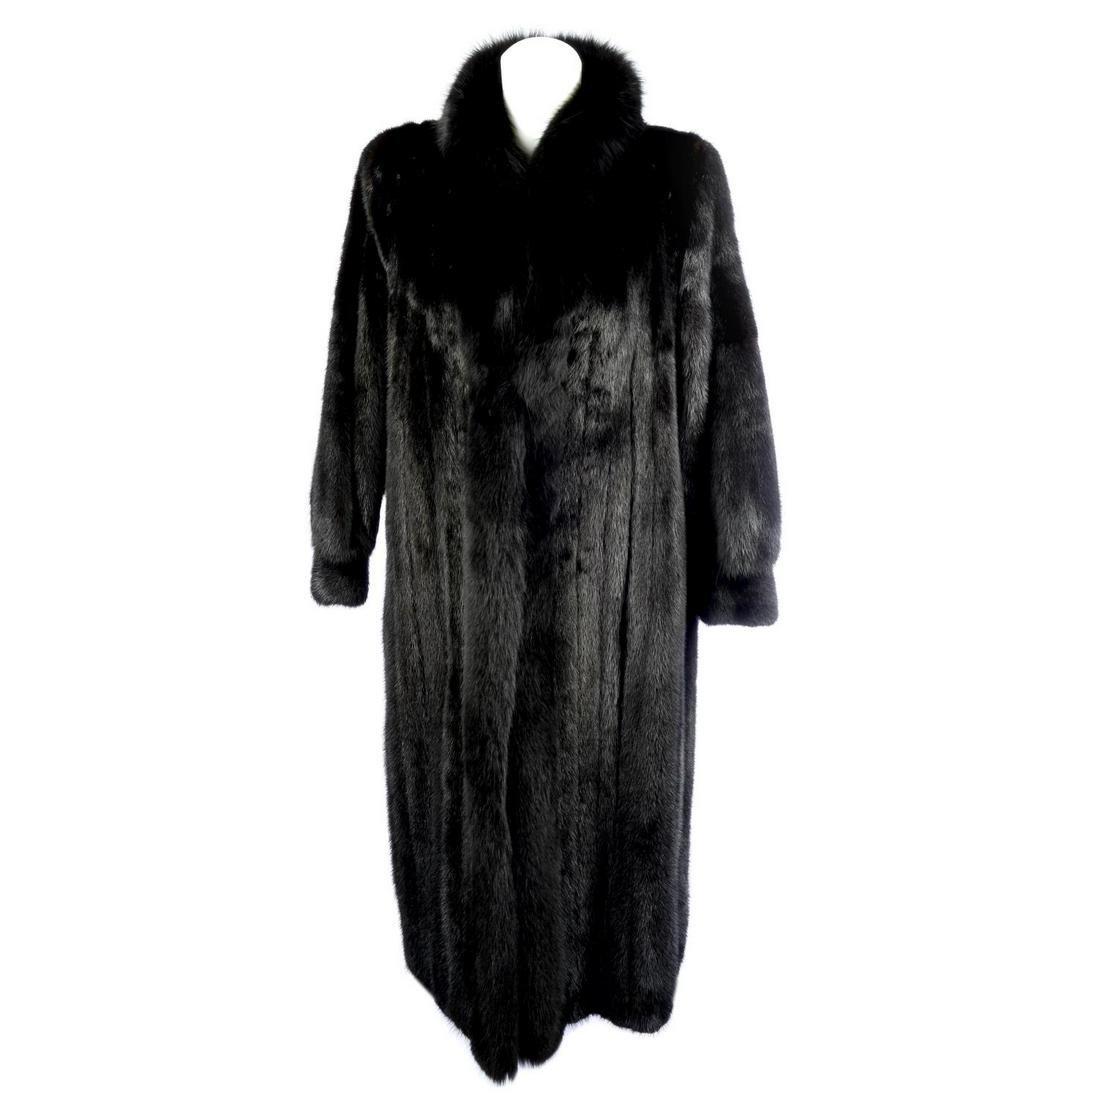 A full length black mink coat with fox fur trim.